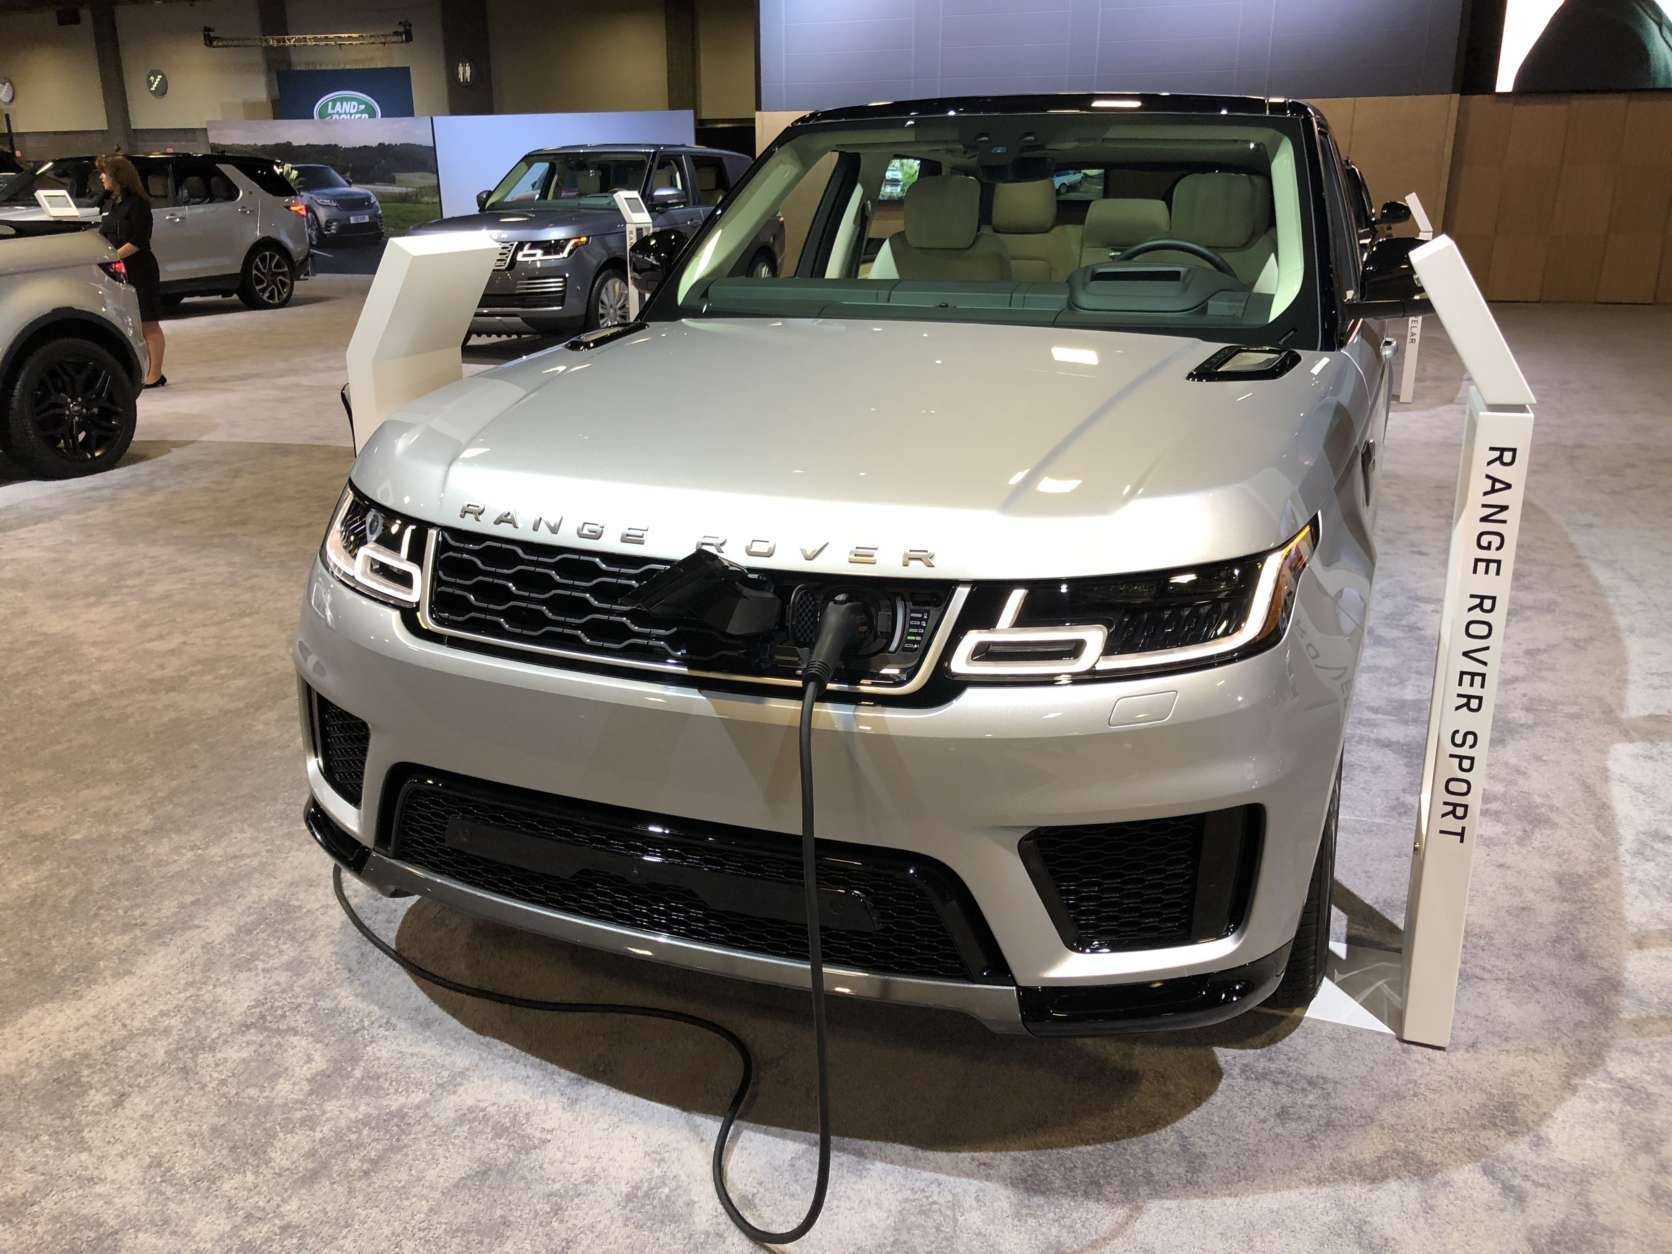 Range Rover Sport Plug-in hybrid (WTOP/Mike Parris)